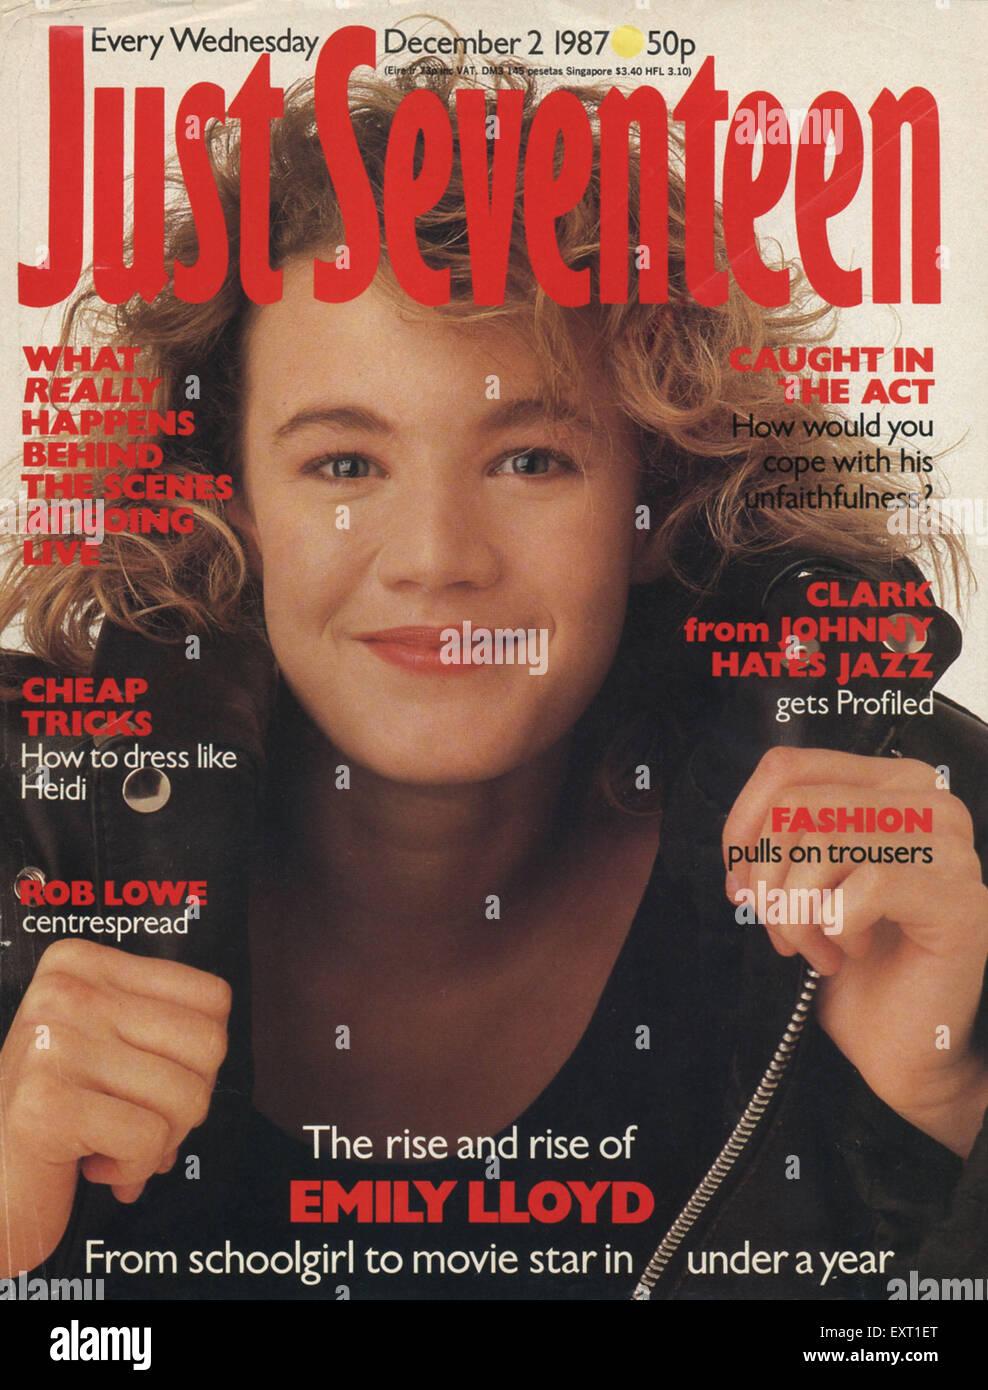 1980s UK Just Seventeen Magazine Cover - Stock Image